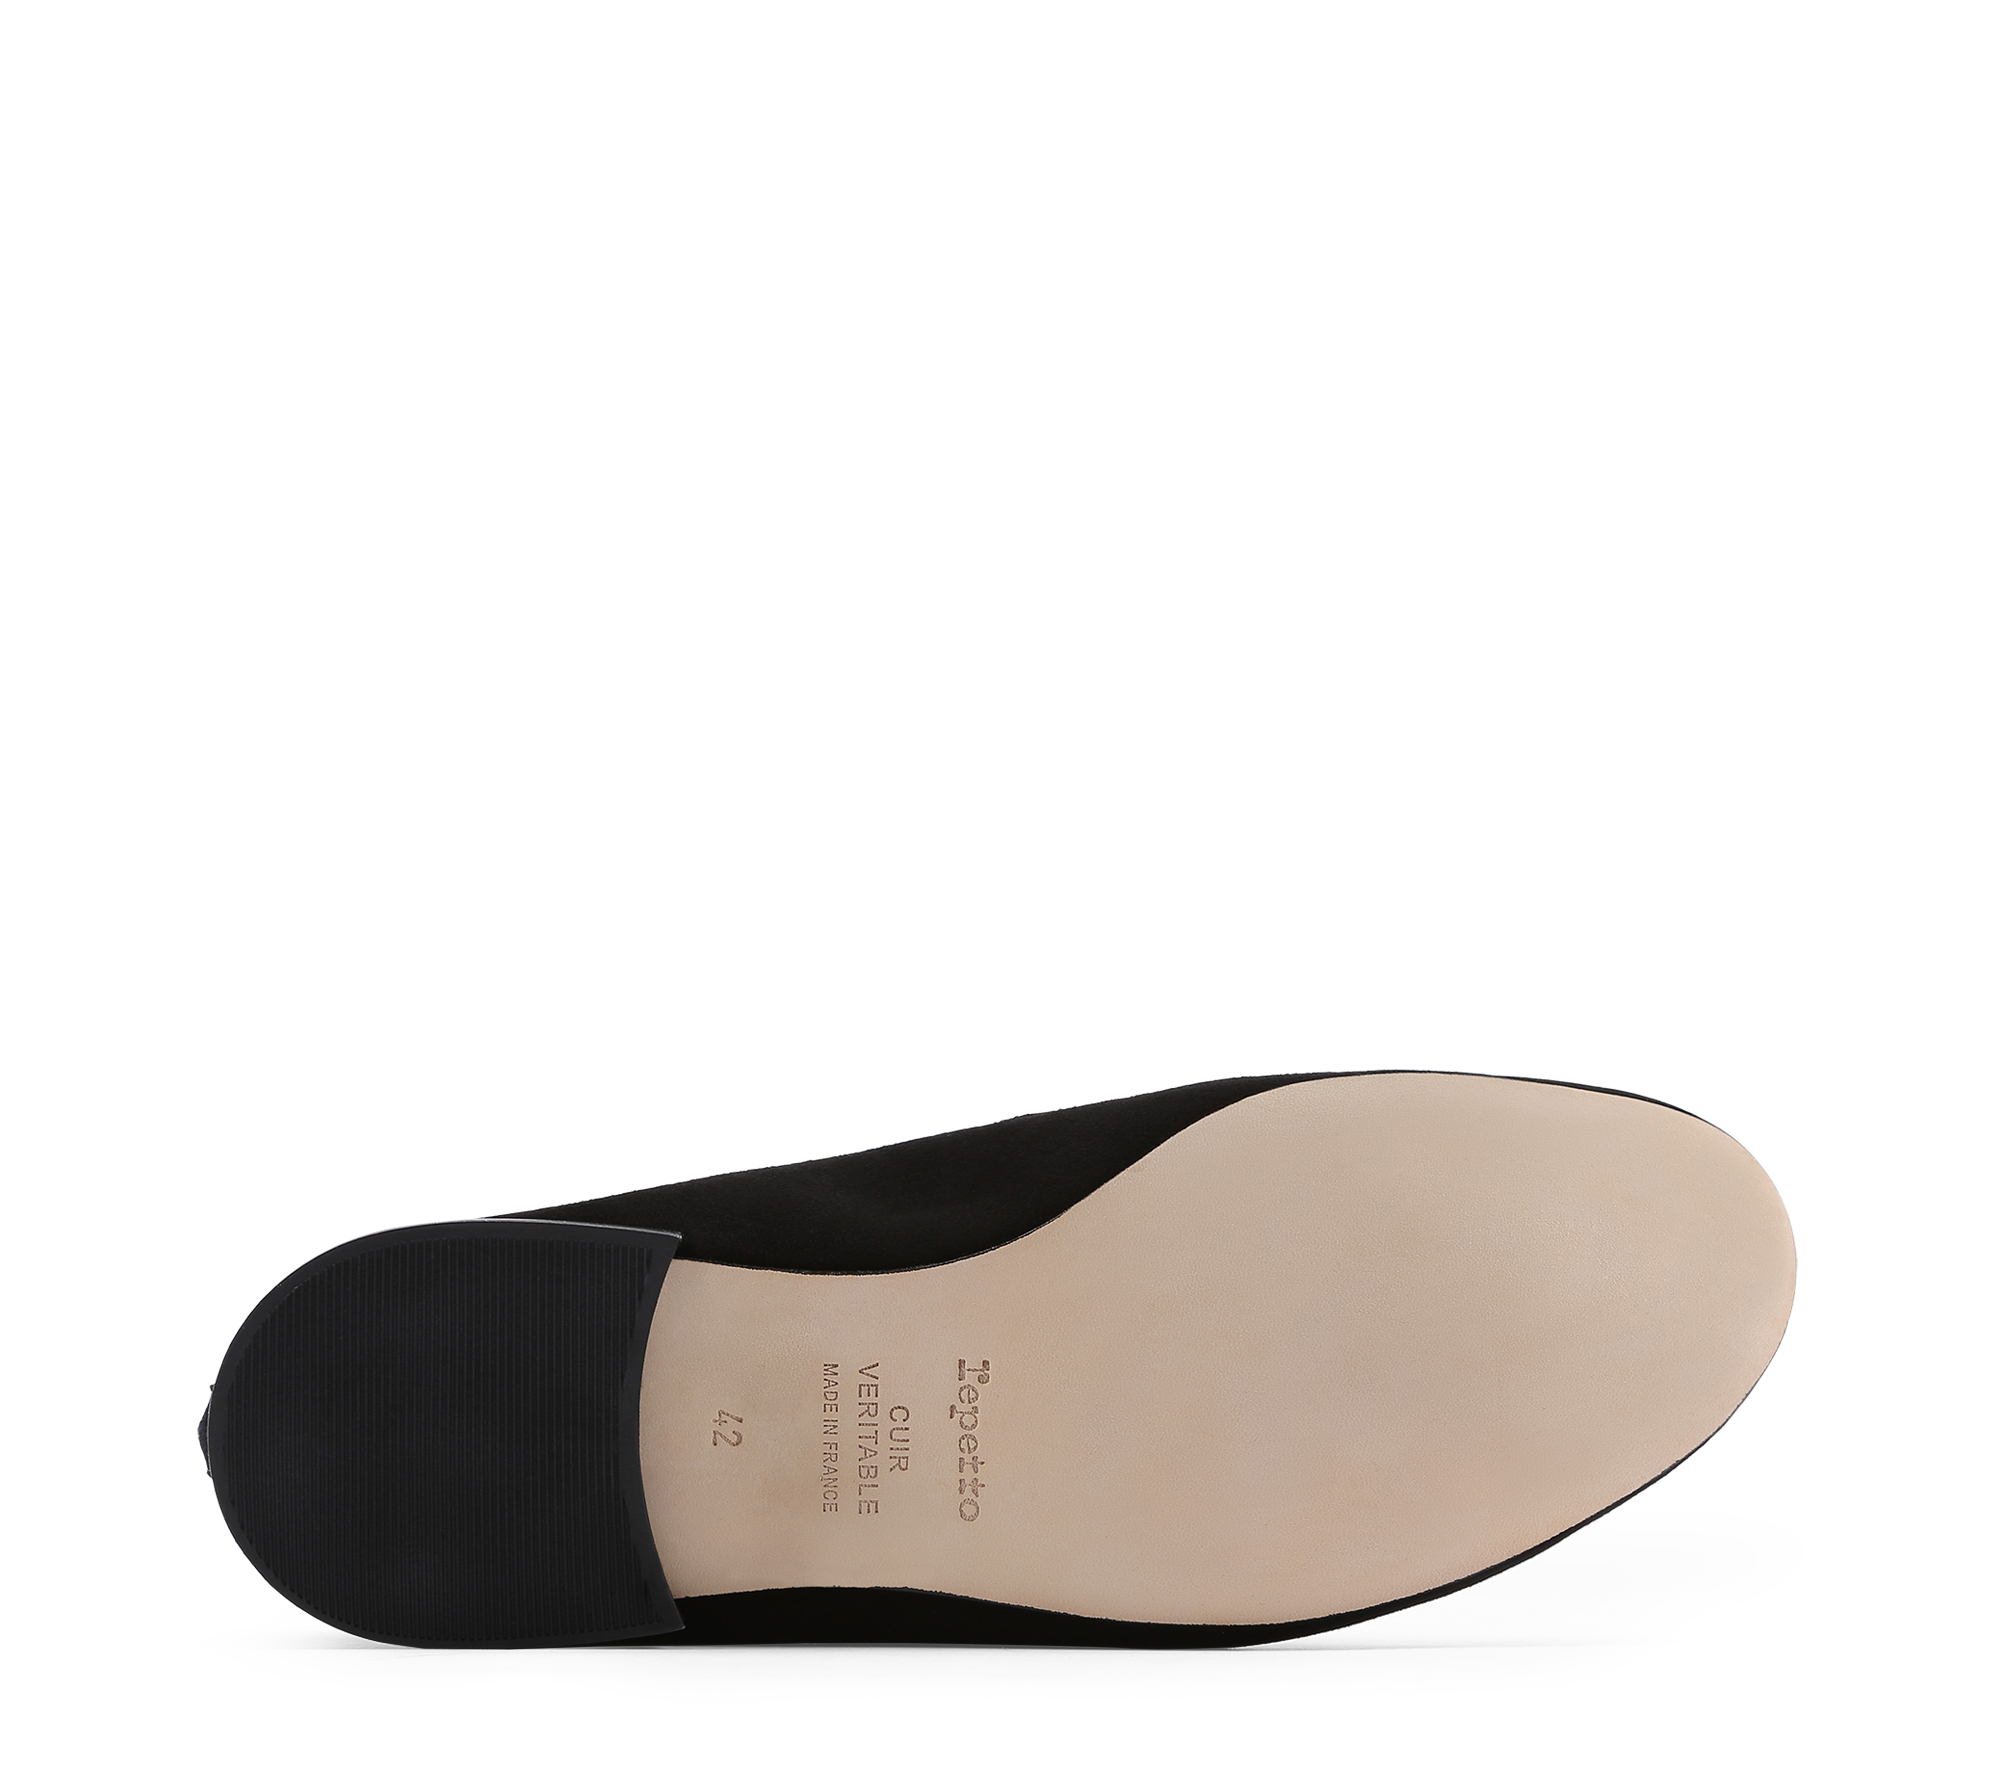 Michael loafers - Men